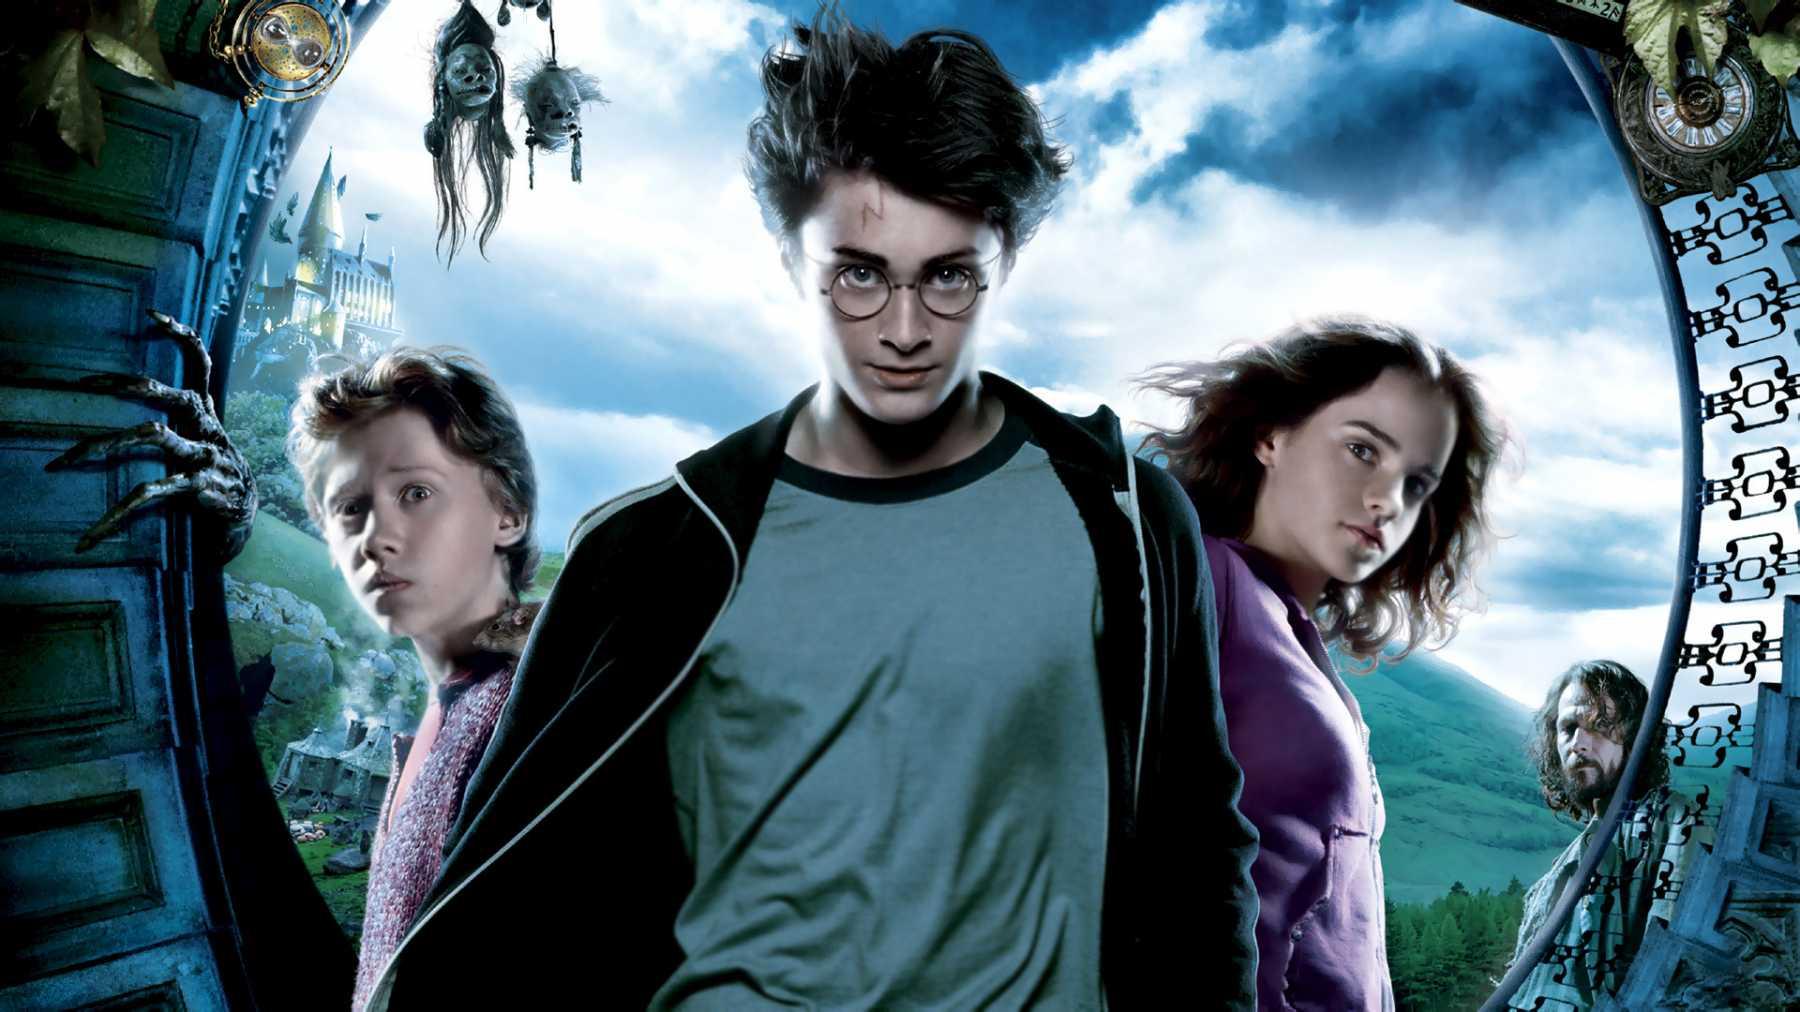 'Harry Potter And The Prisoner Of Azkaban' Live Tweet | Harry Potter